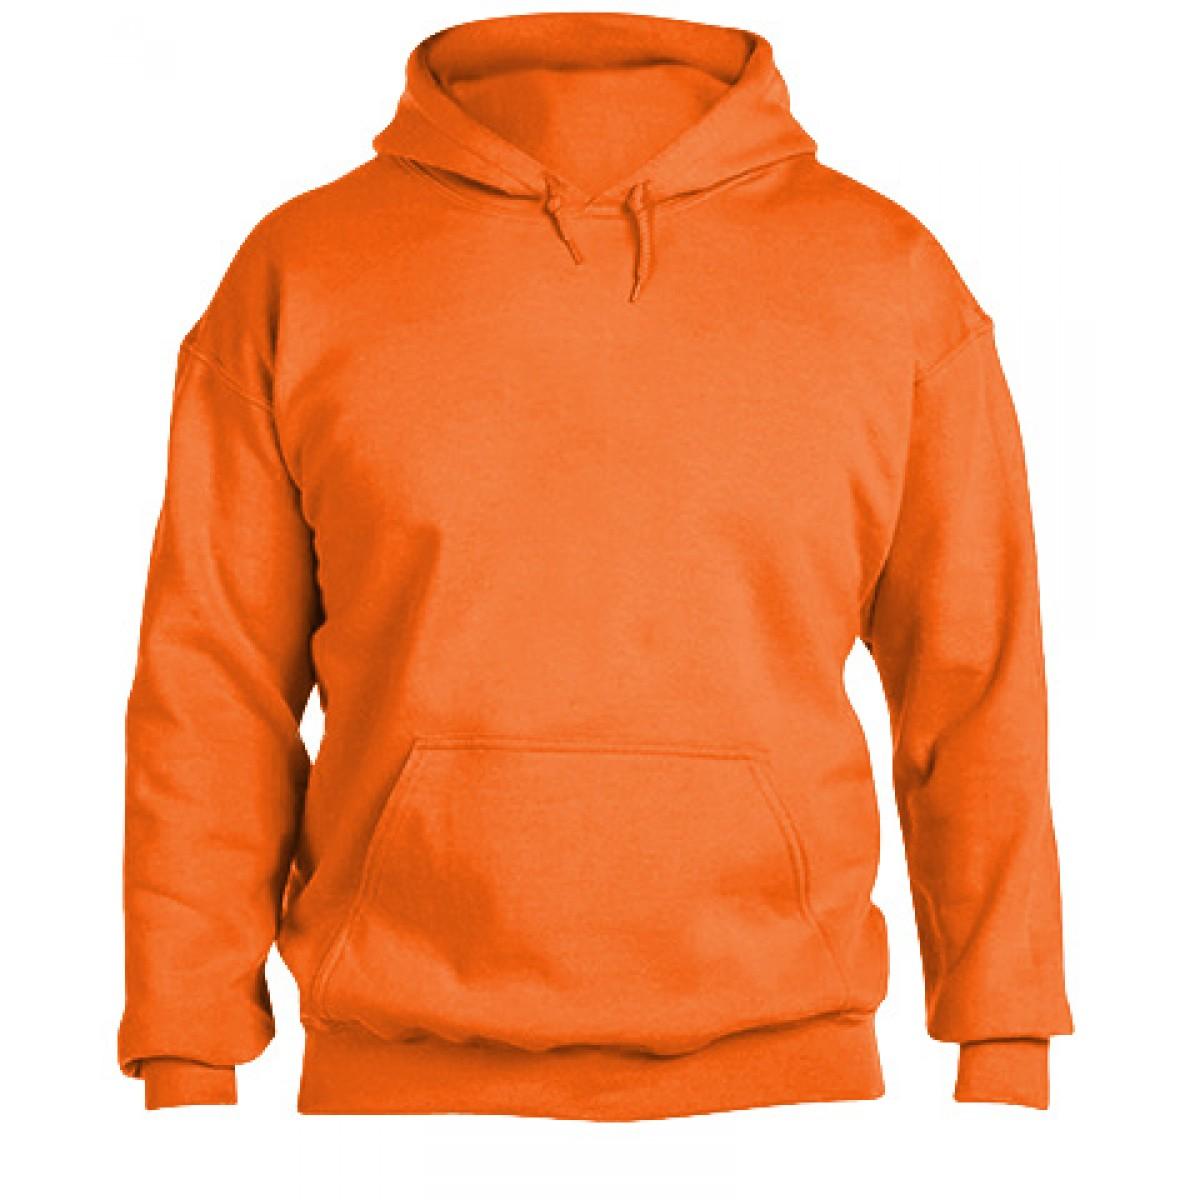 Hooded Sweatshirt 50/50 Heavy Blend-Safety Orange-3XL